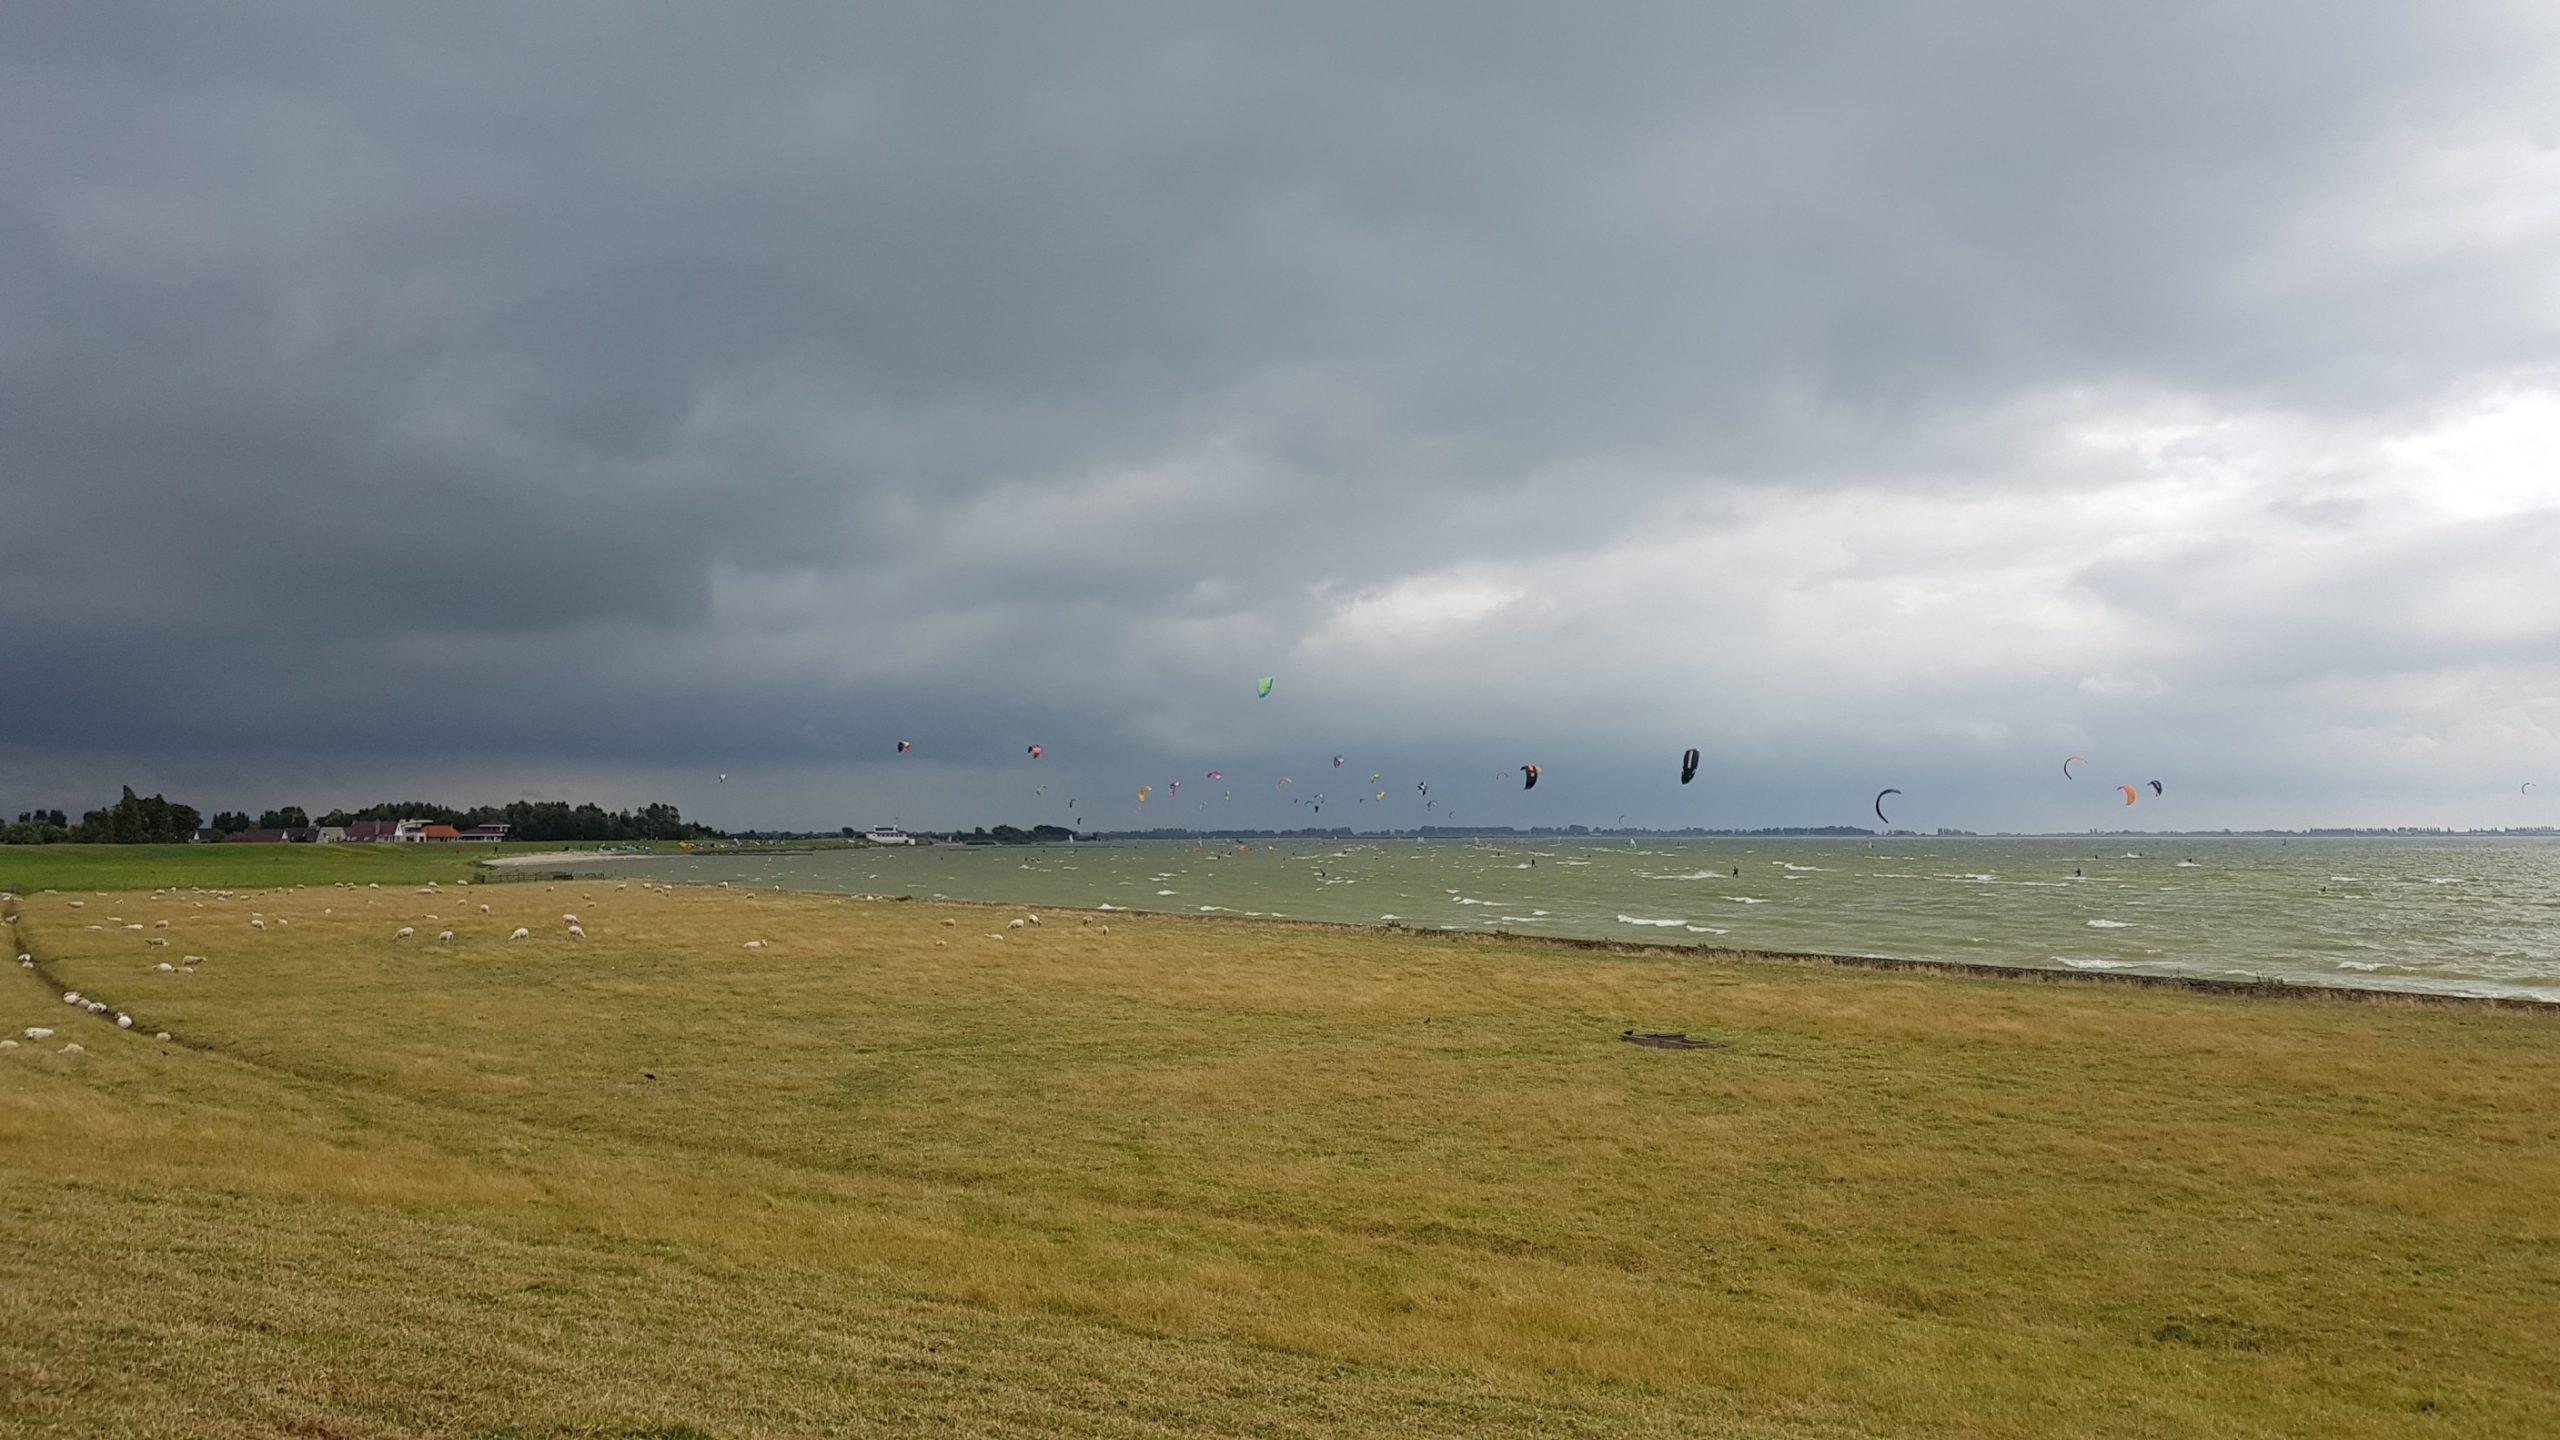 Kitesufers